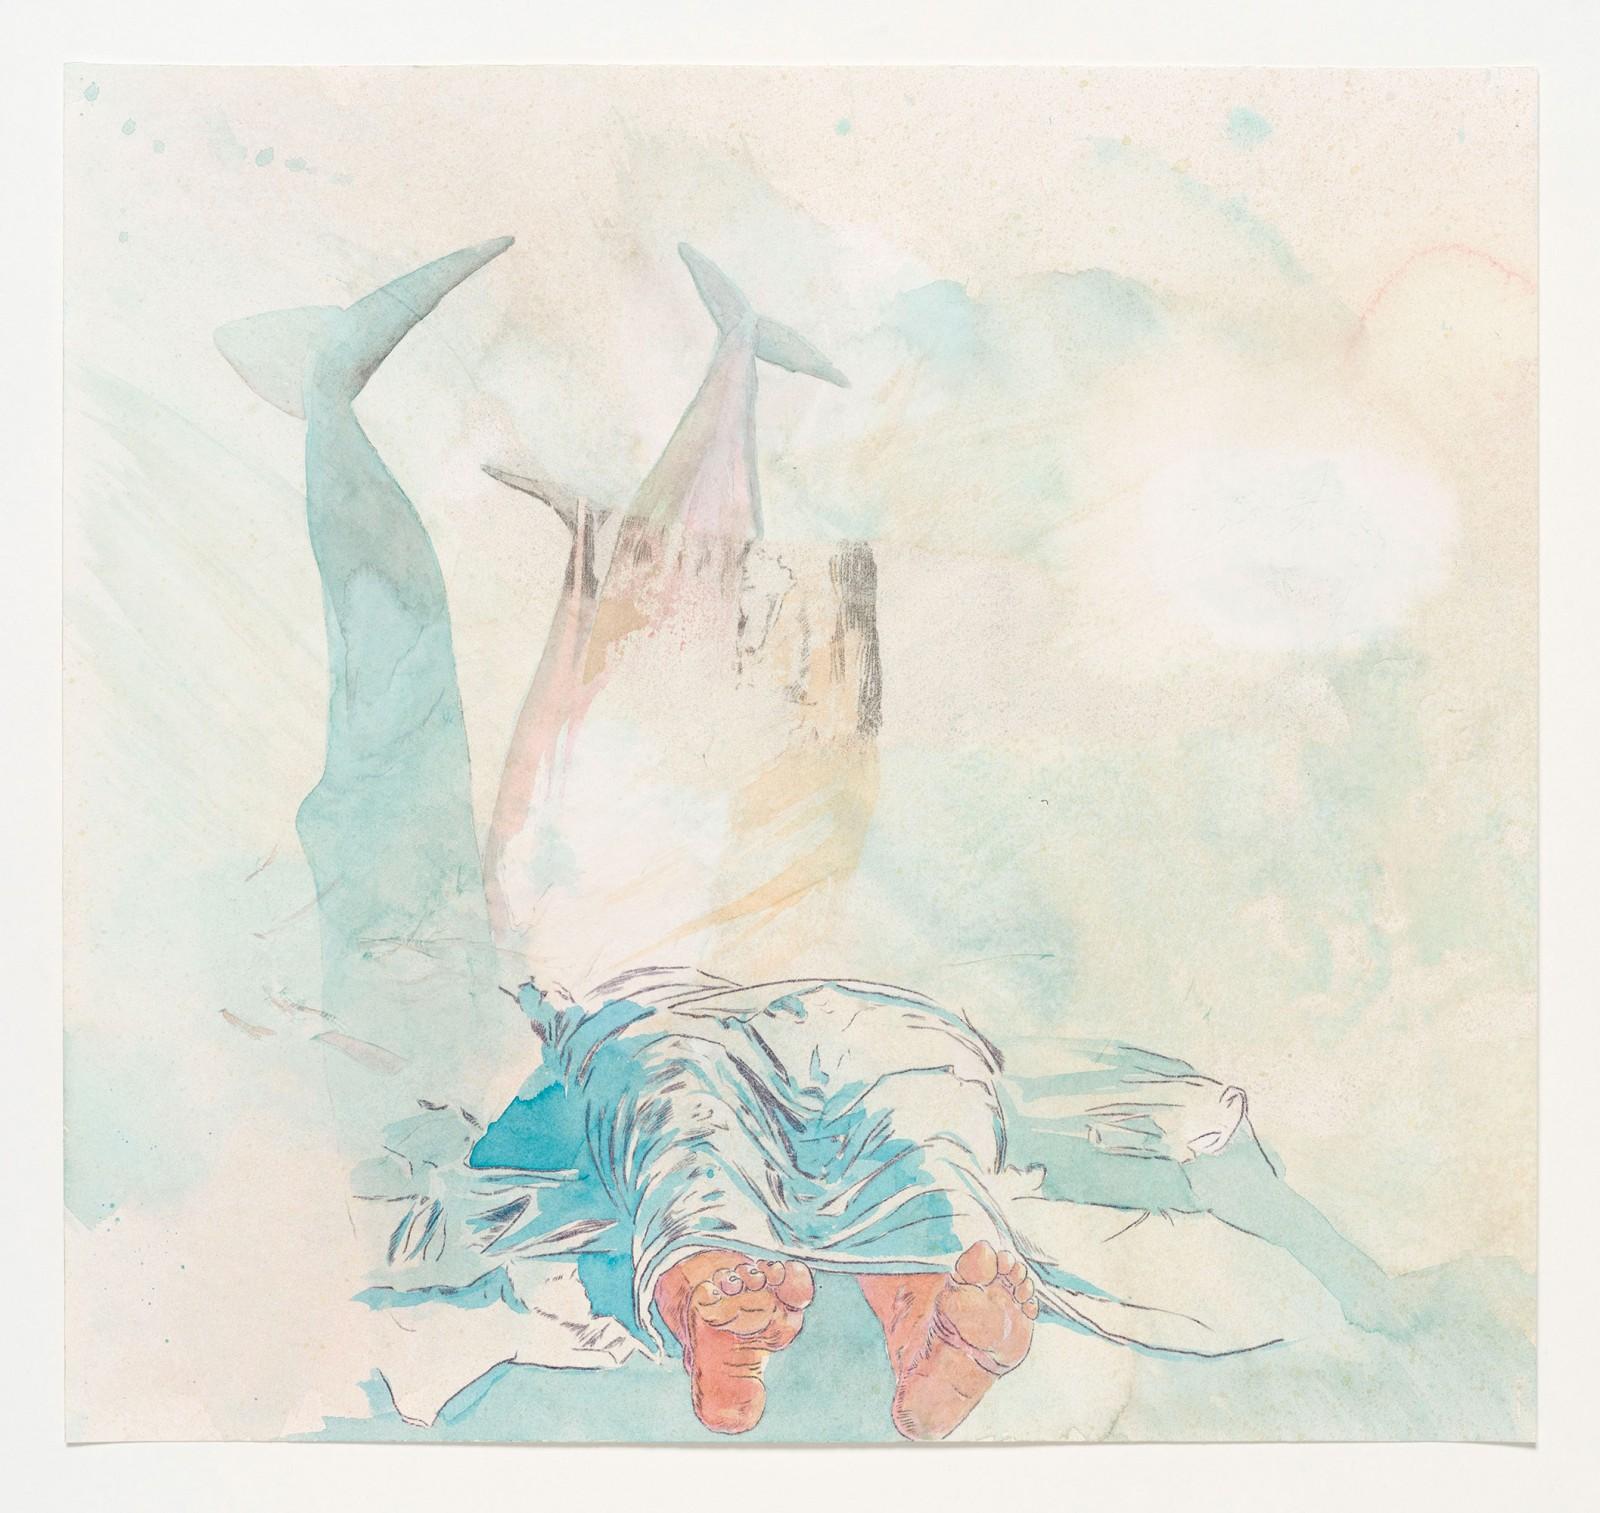 Kim Nekarda: untitled, 2019, carbon & watercolour on paper, 42 x 45 cm